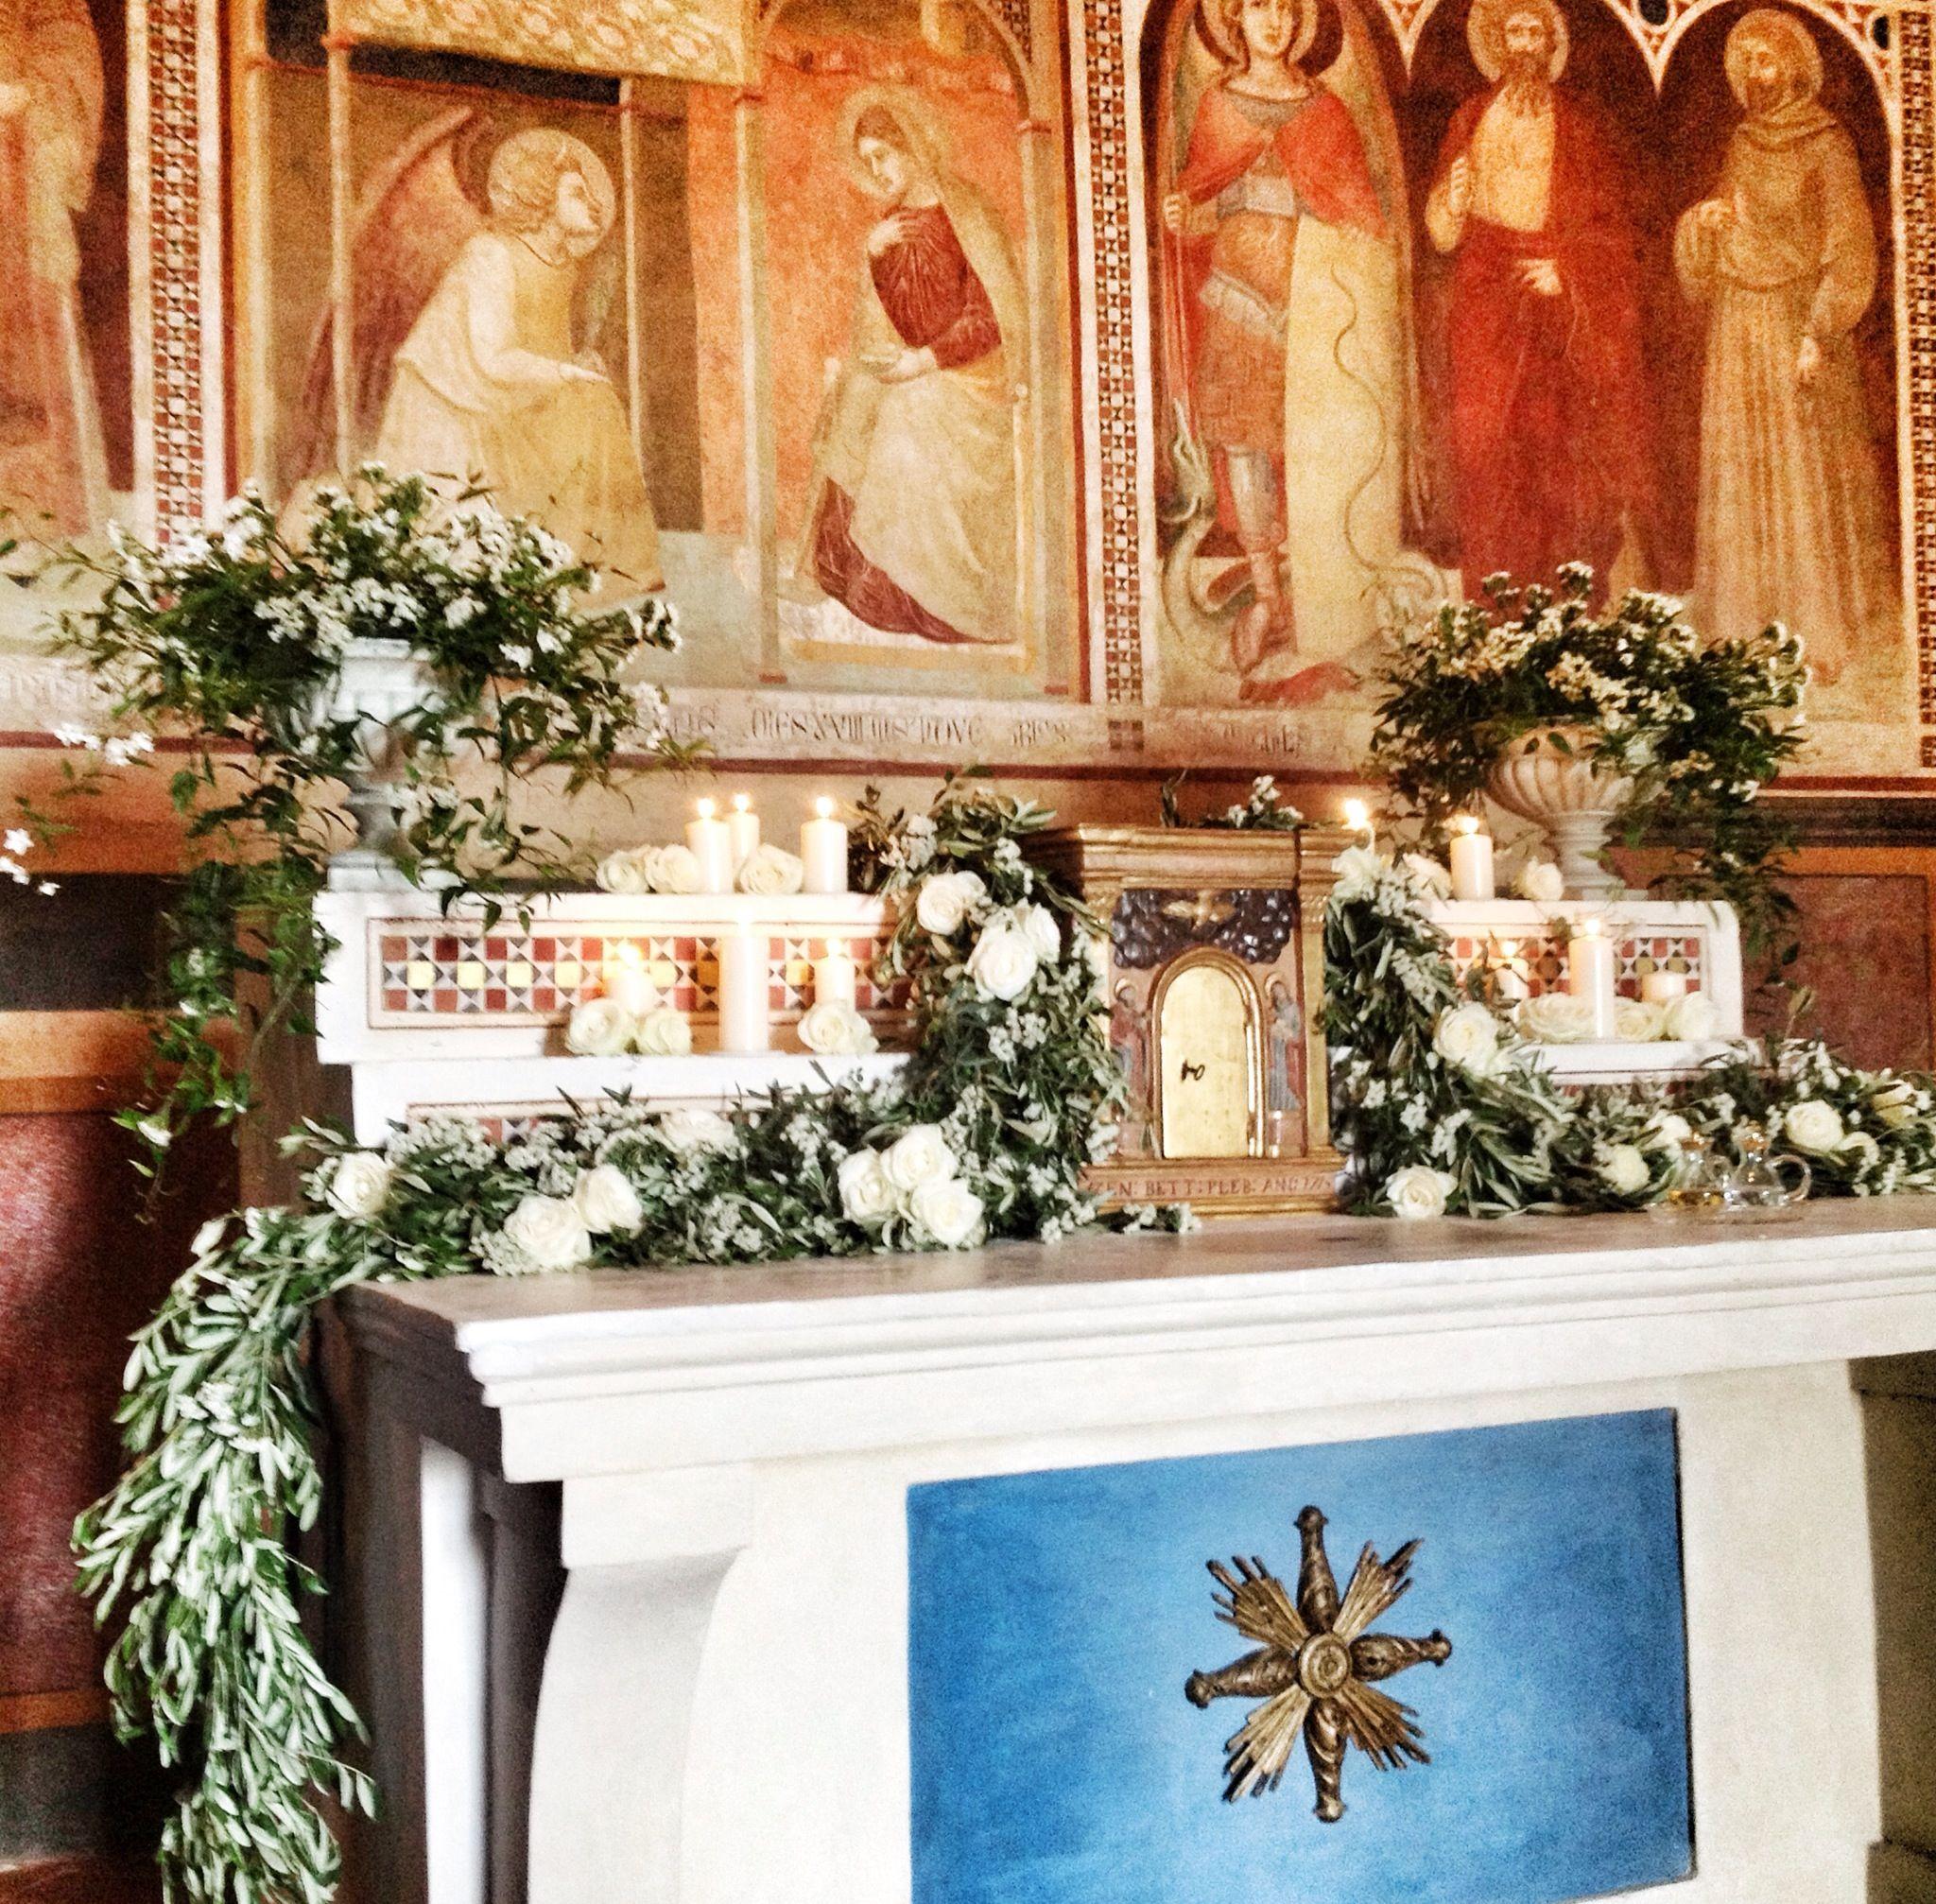 Wedding Altar Design Resource: Ceremony Church Decor